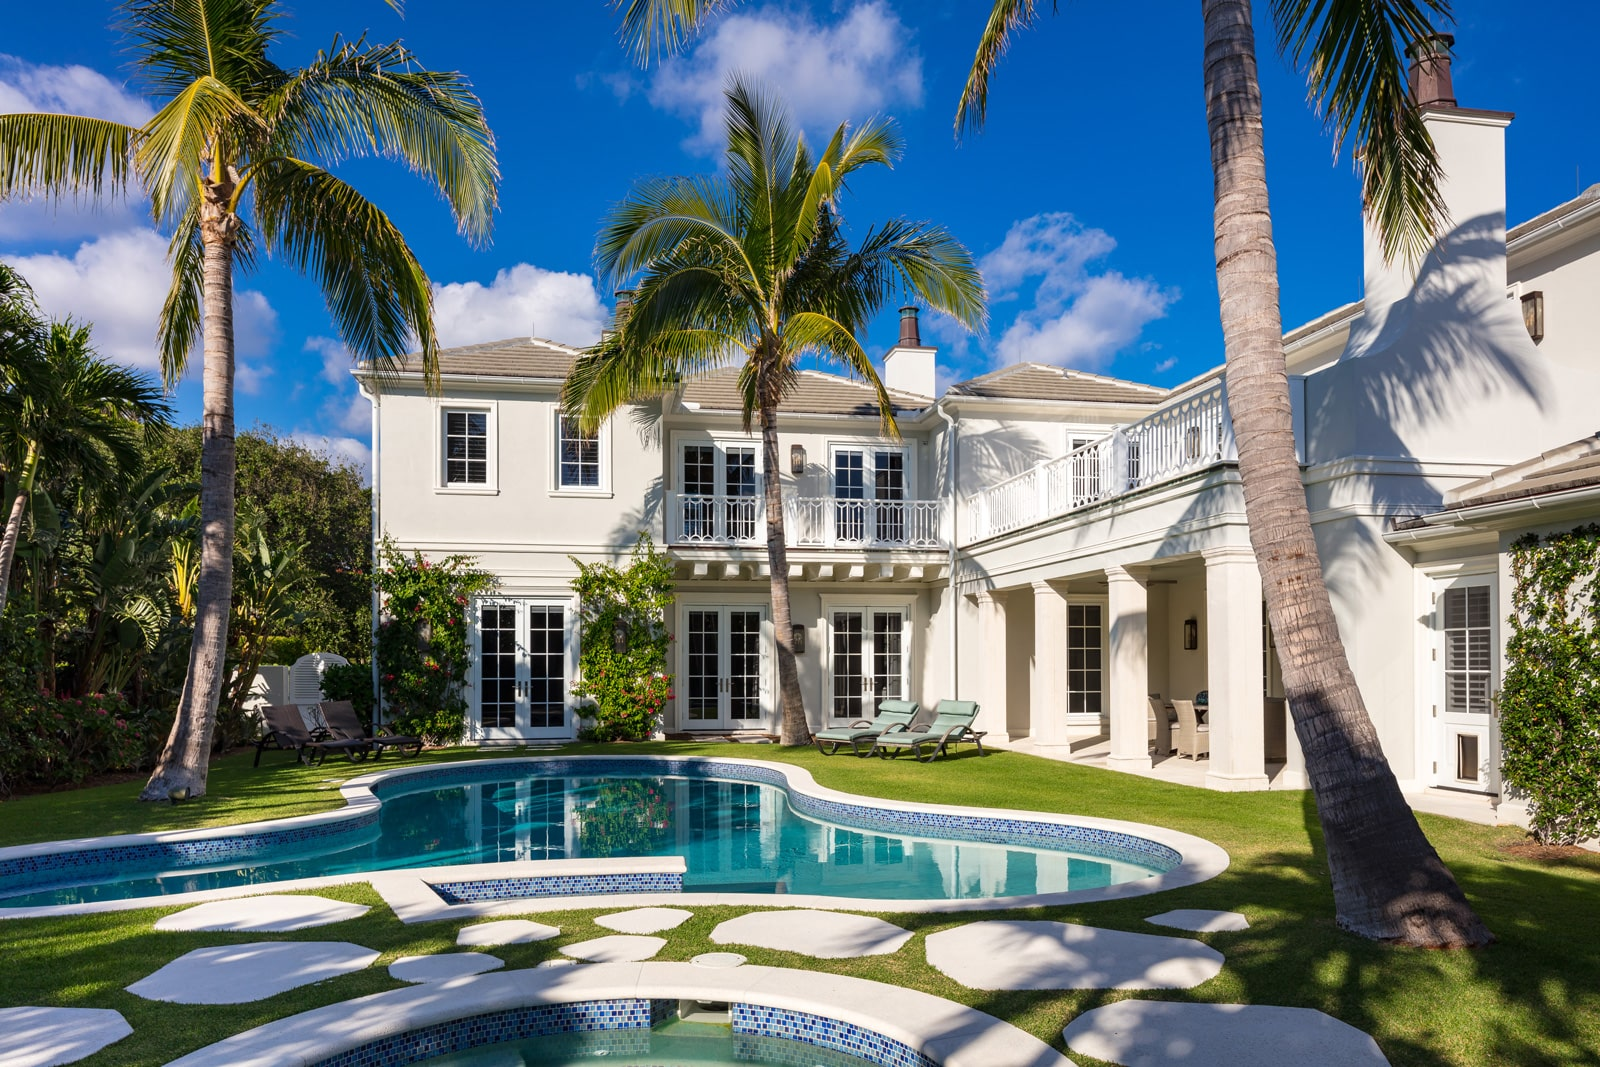 ecclestone-homes-palm-beach-backyard-renovation-with-pool-pg10-min